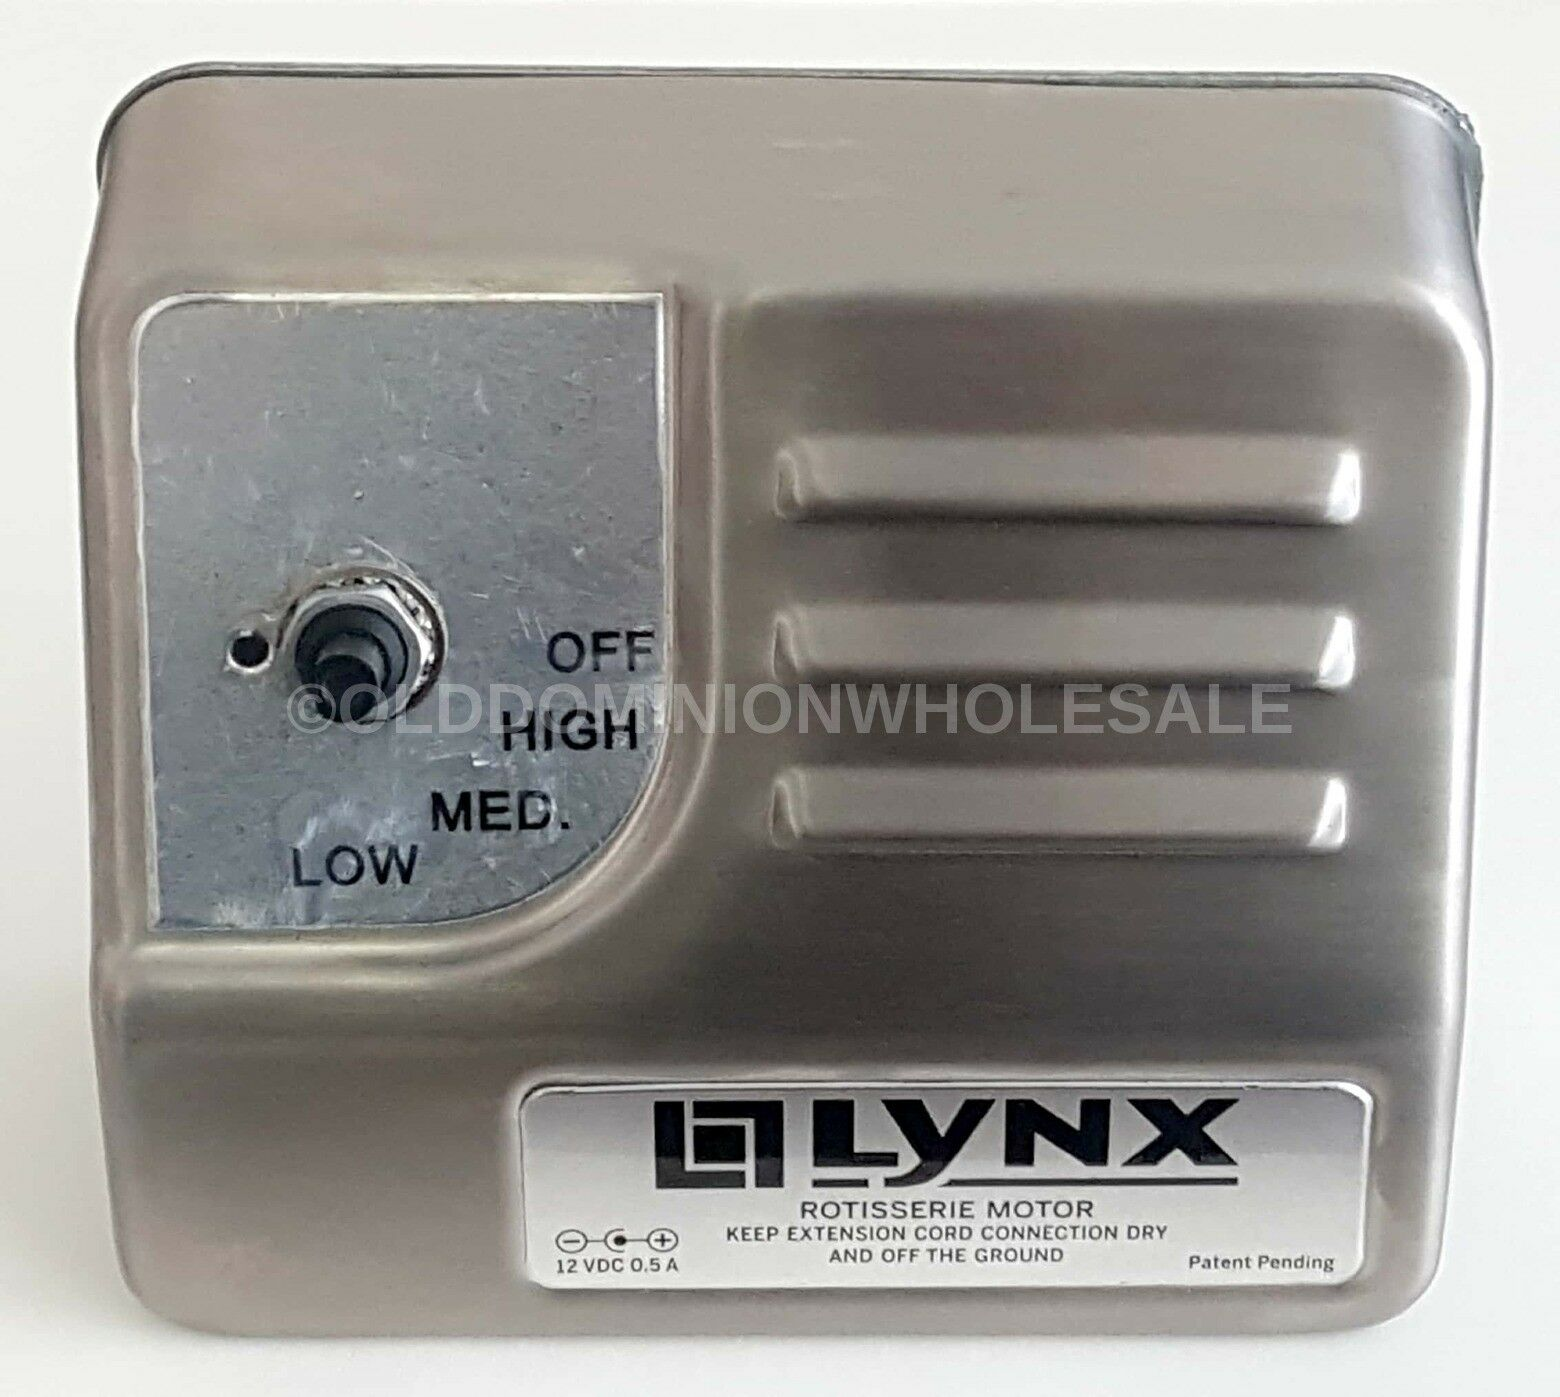 New Lynx 3-Speed redisserie Grill Motor Stainless Steel 12 VDC 0.5A 80277